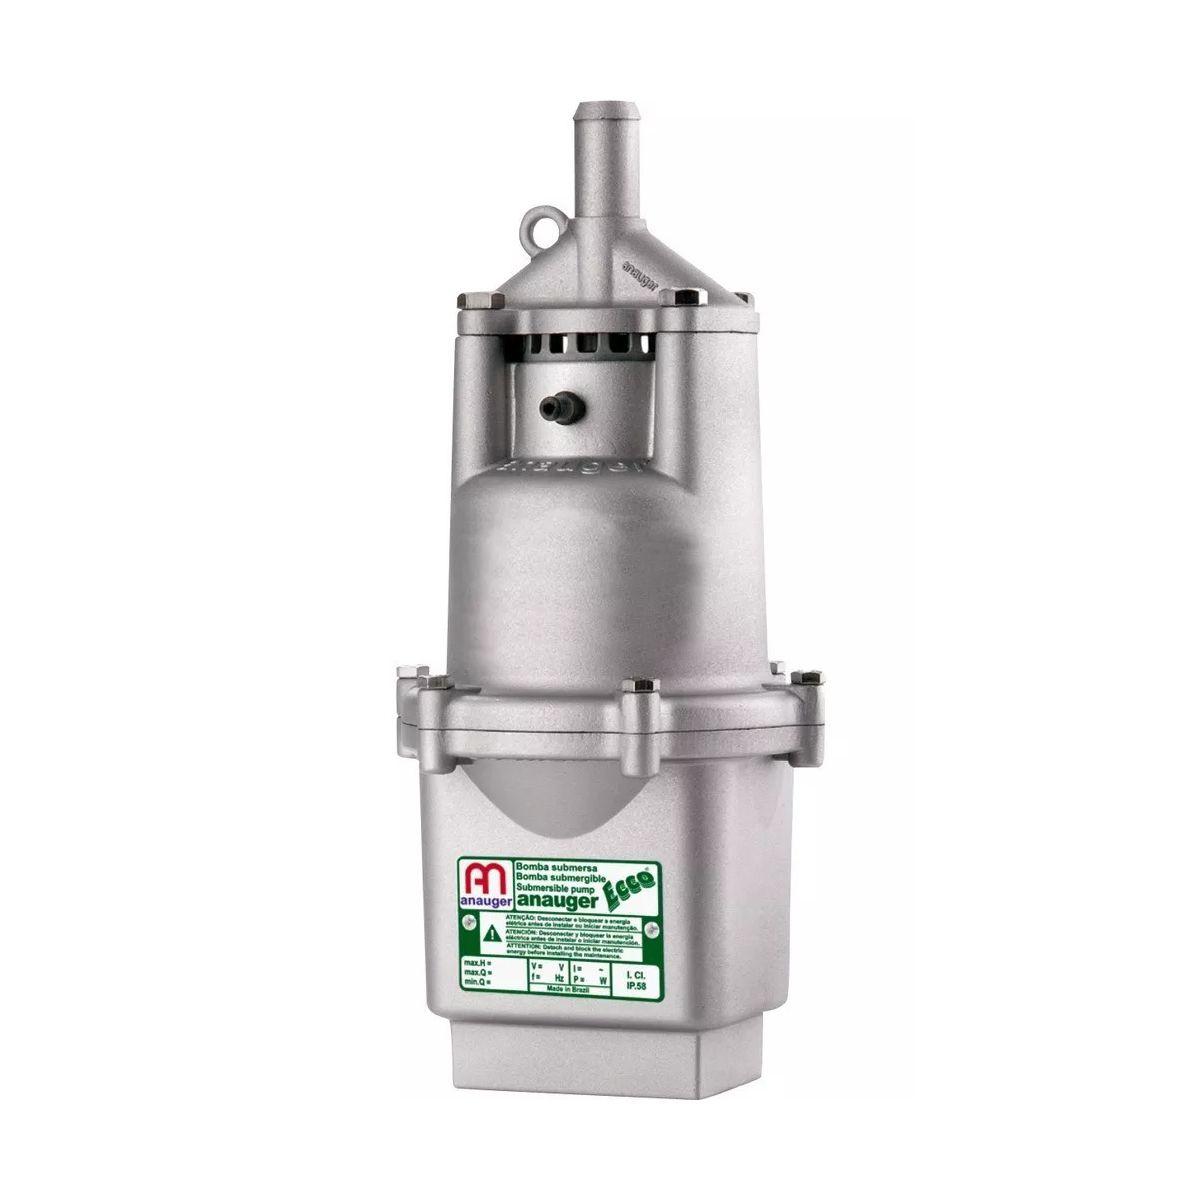 Bomba Submersa Anauger Ecco para poço Potência de 300 Watts 220V